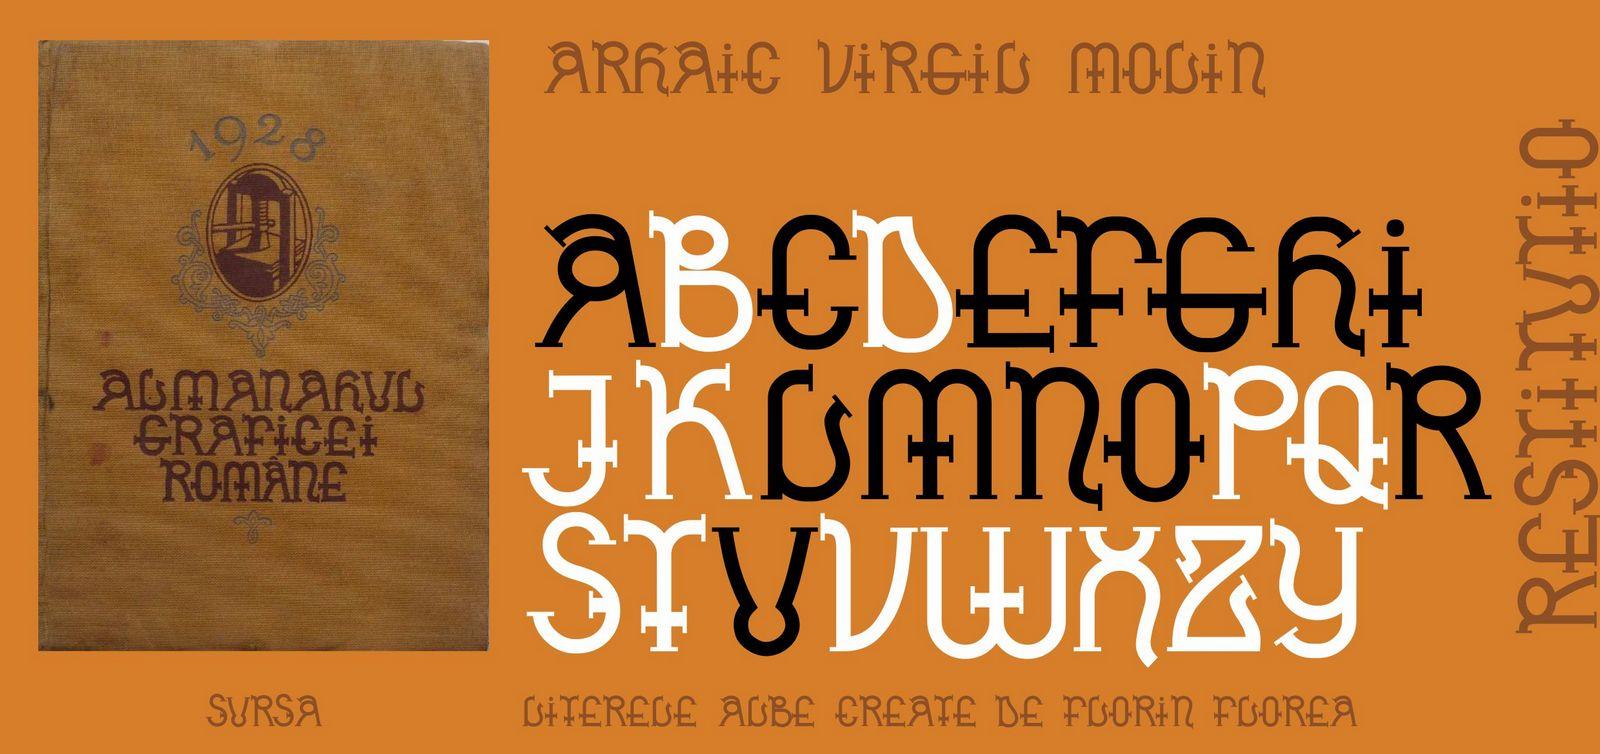 Font Arhaic Virgil Molin